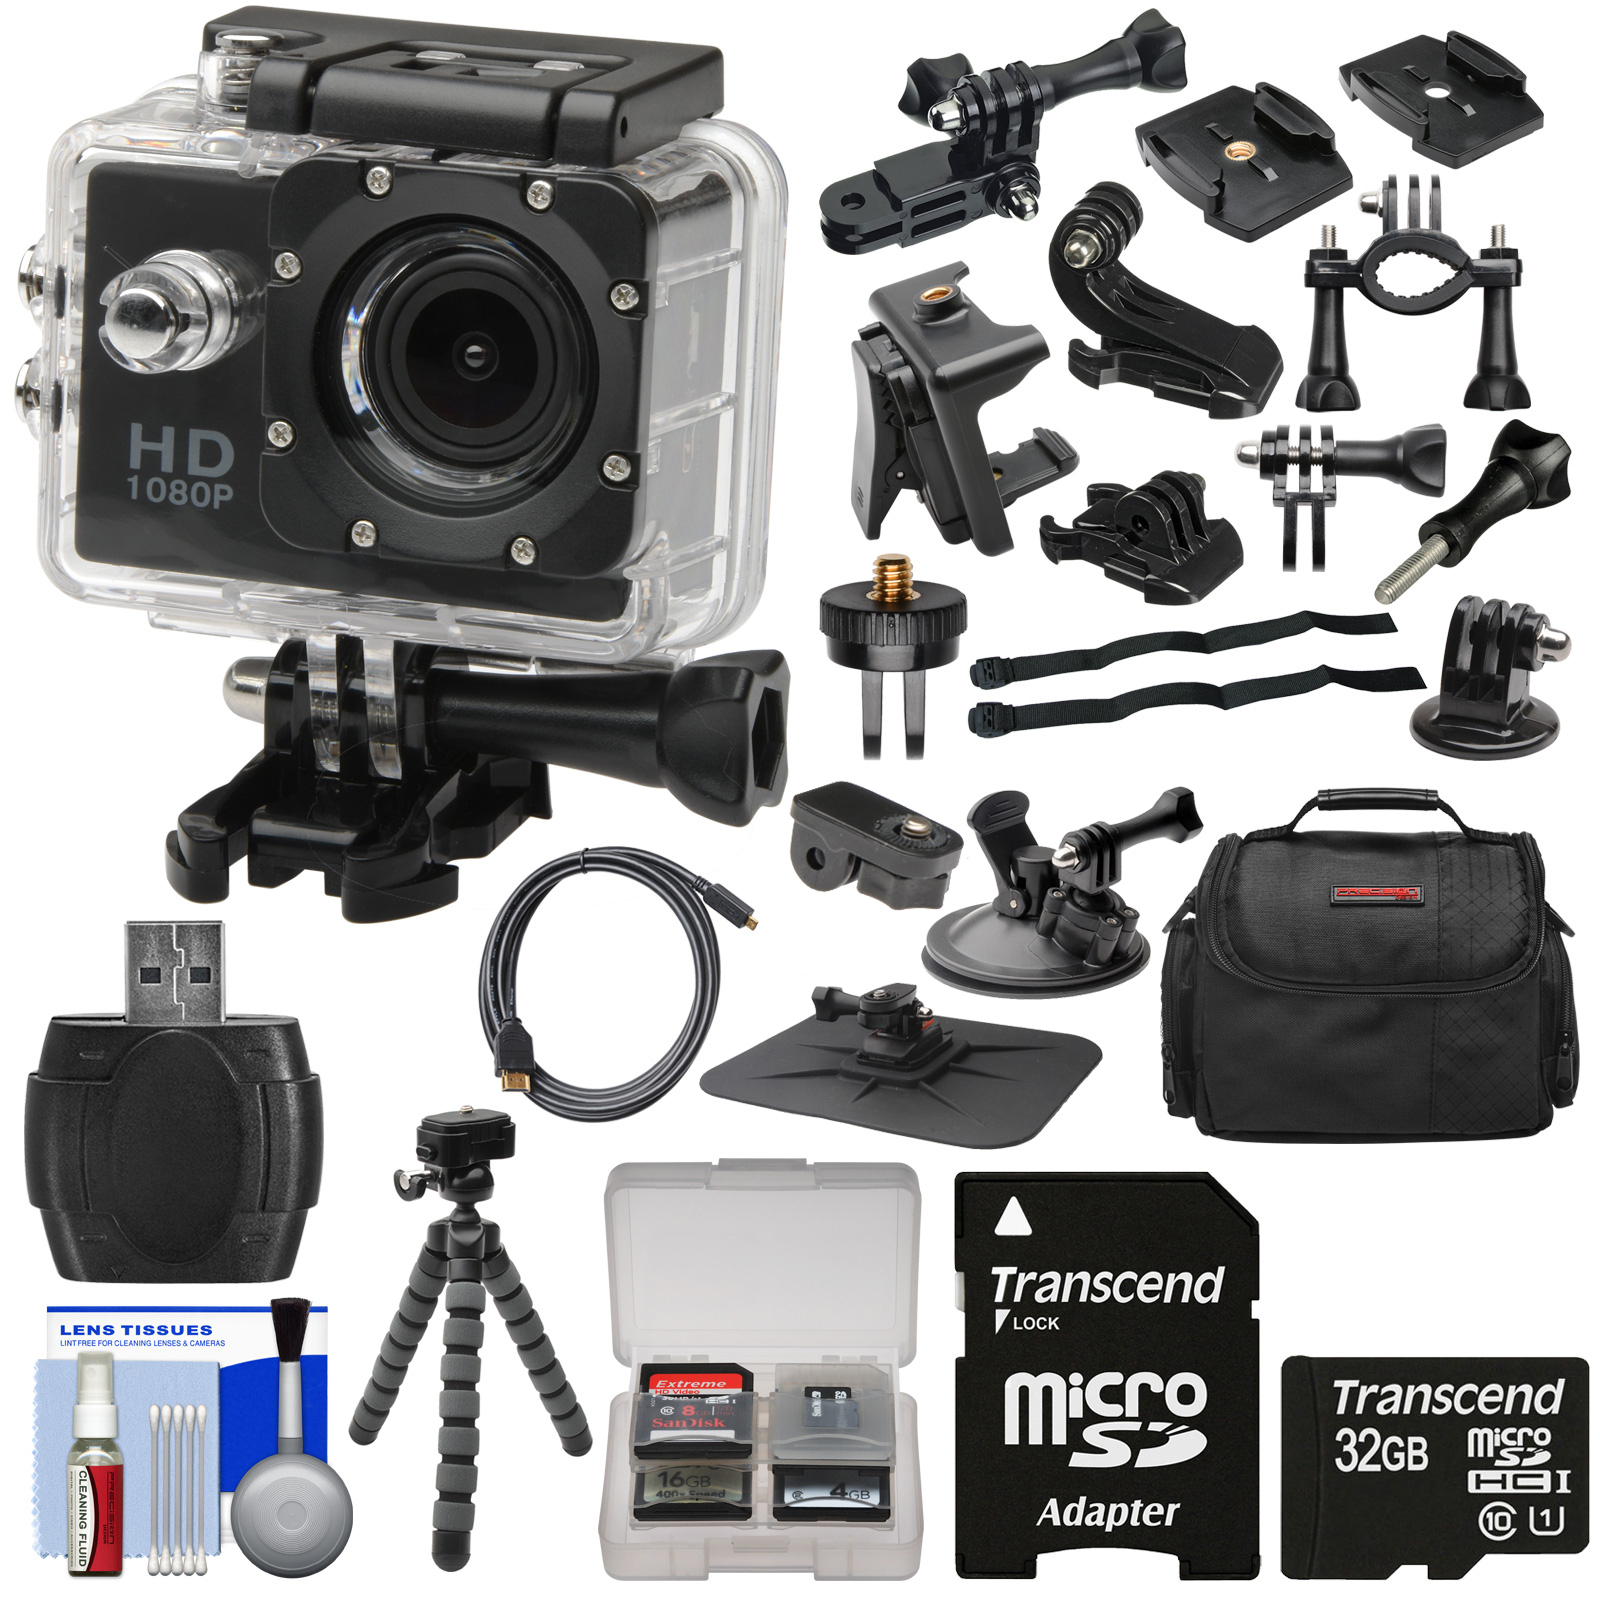 Zuma HD DVR 1080p Sports Video Recorder Action Camera Cam...